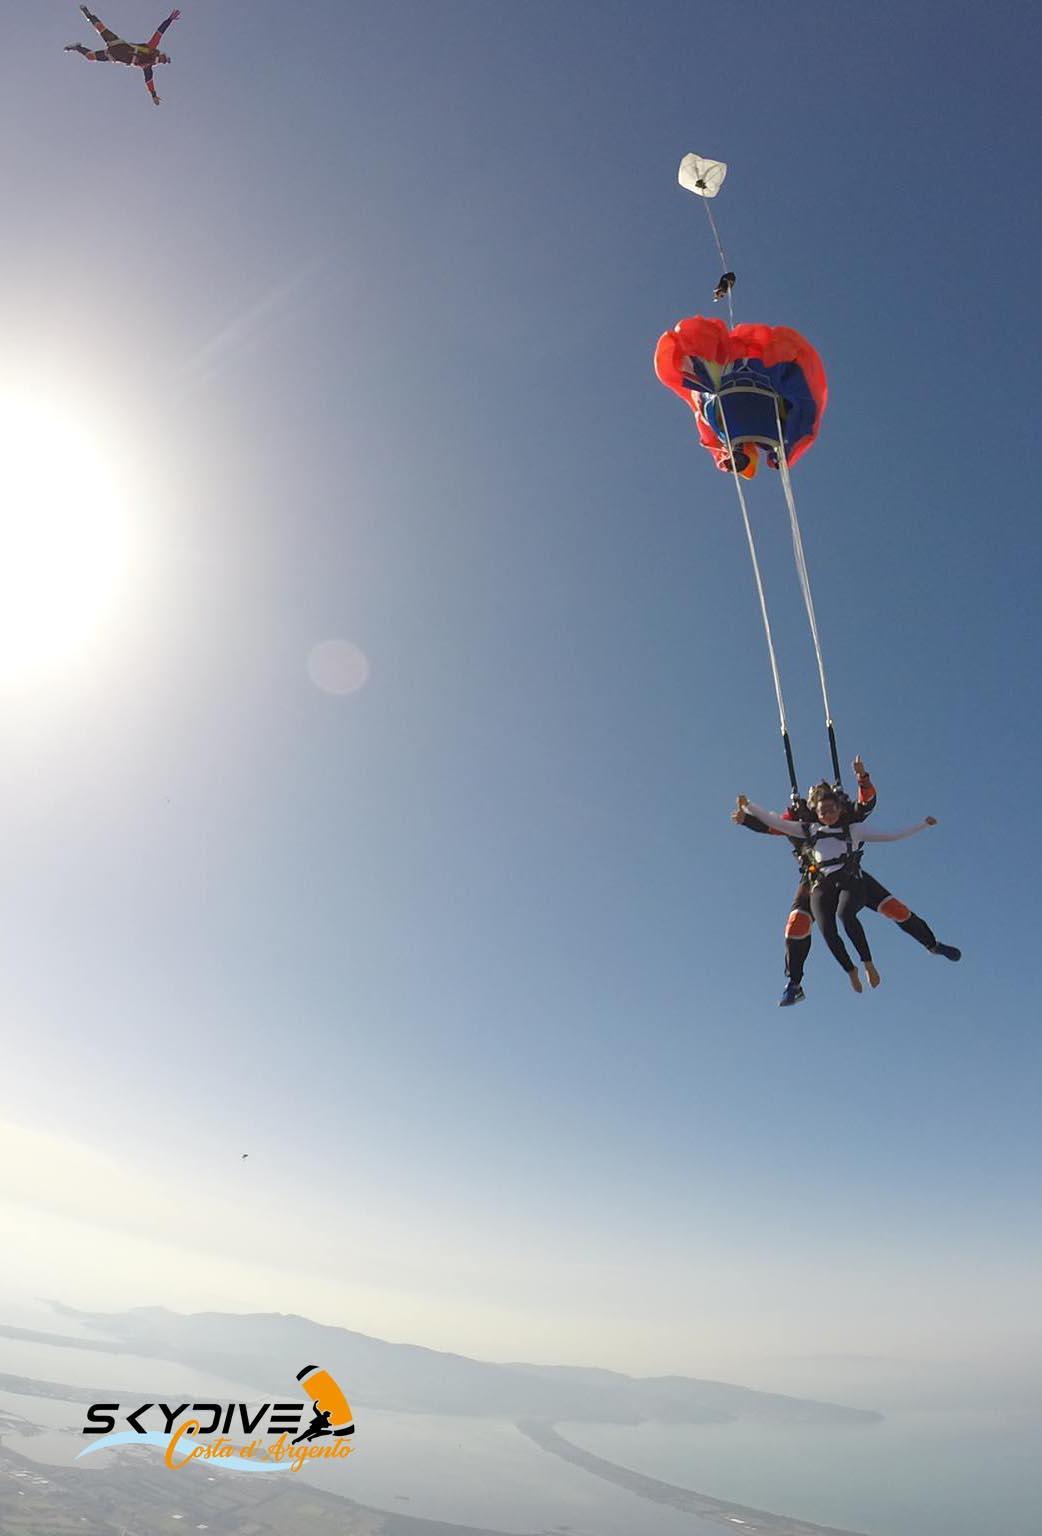 skydive-toscana-lanci-paracadute-argentario1